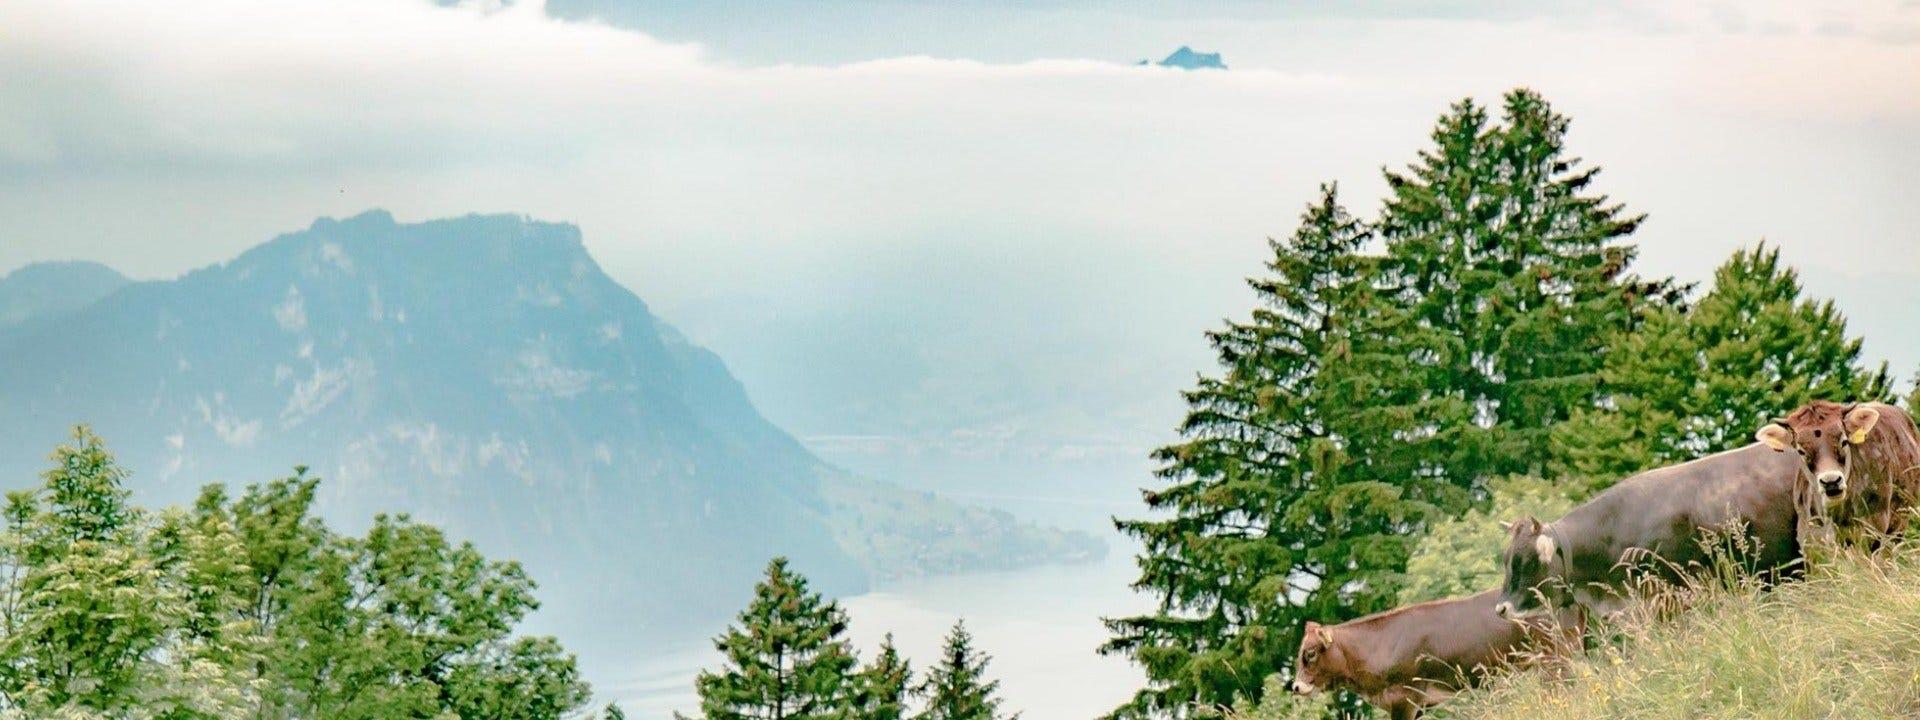 Organic farm in Swiss Alps